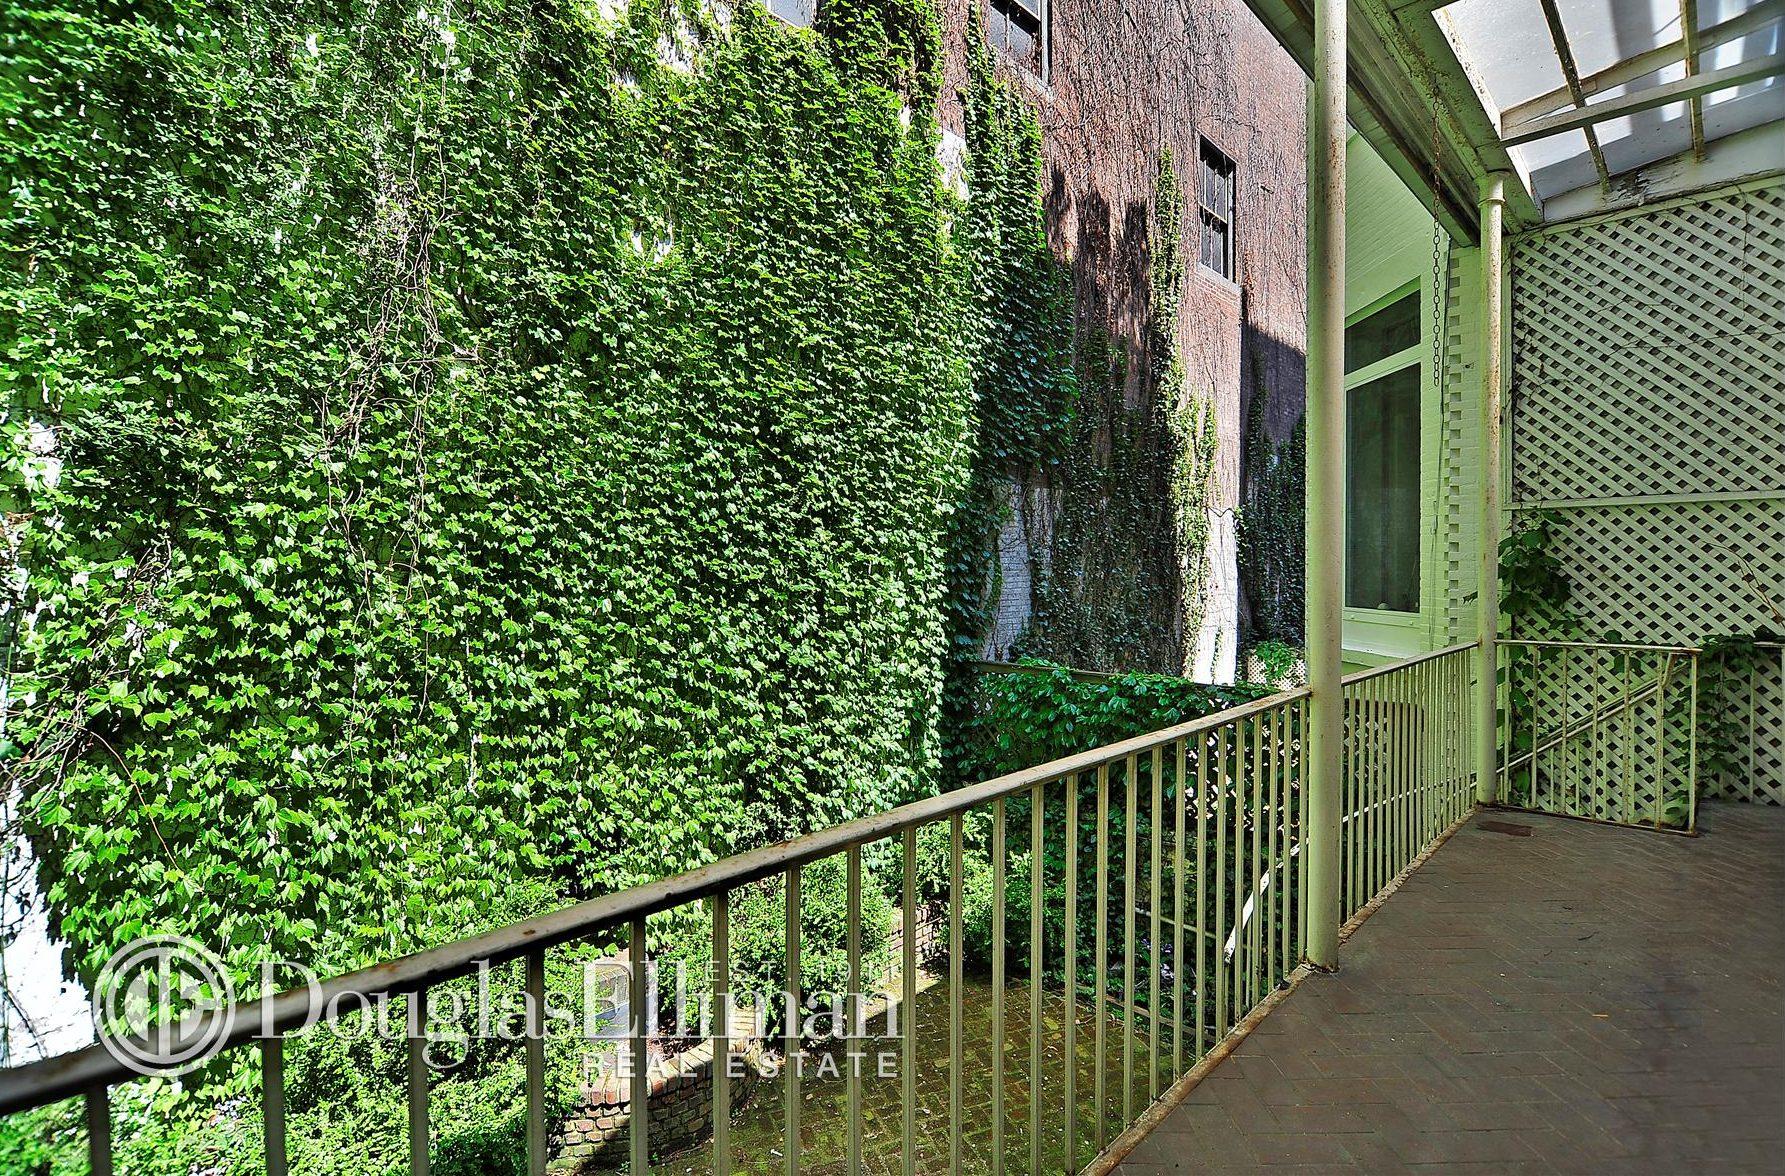 4 Gramercy Park West, Bob Dylan, Gramercy Park